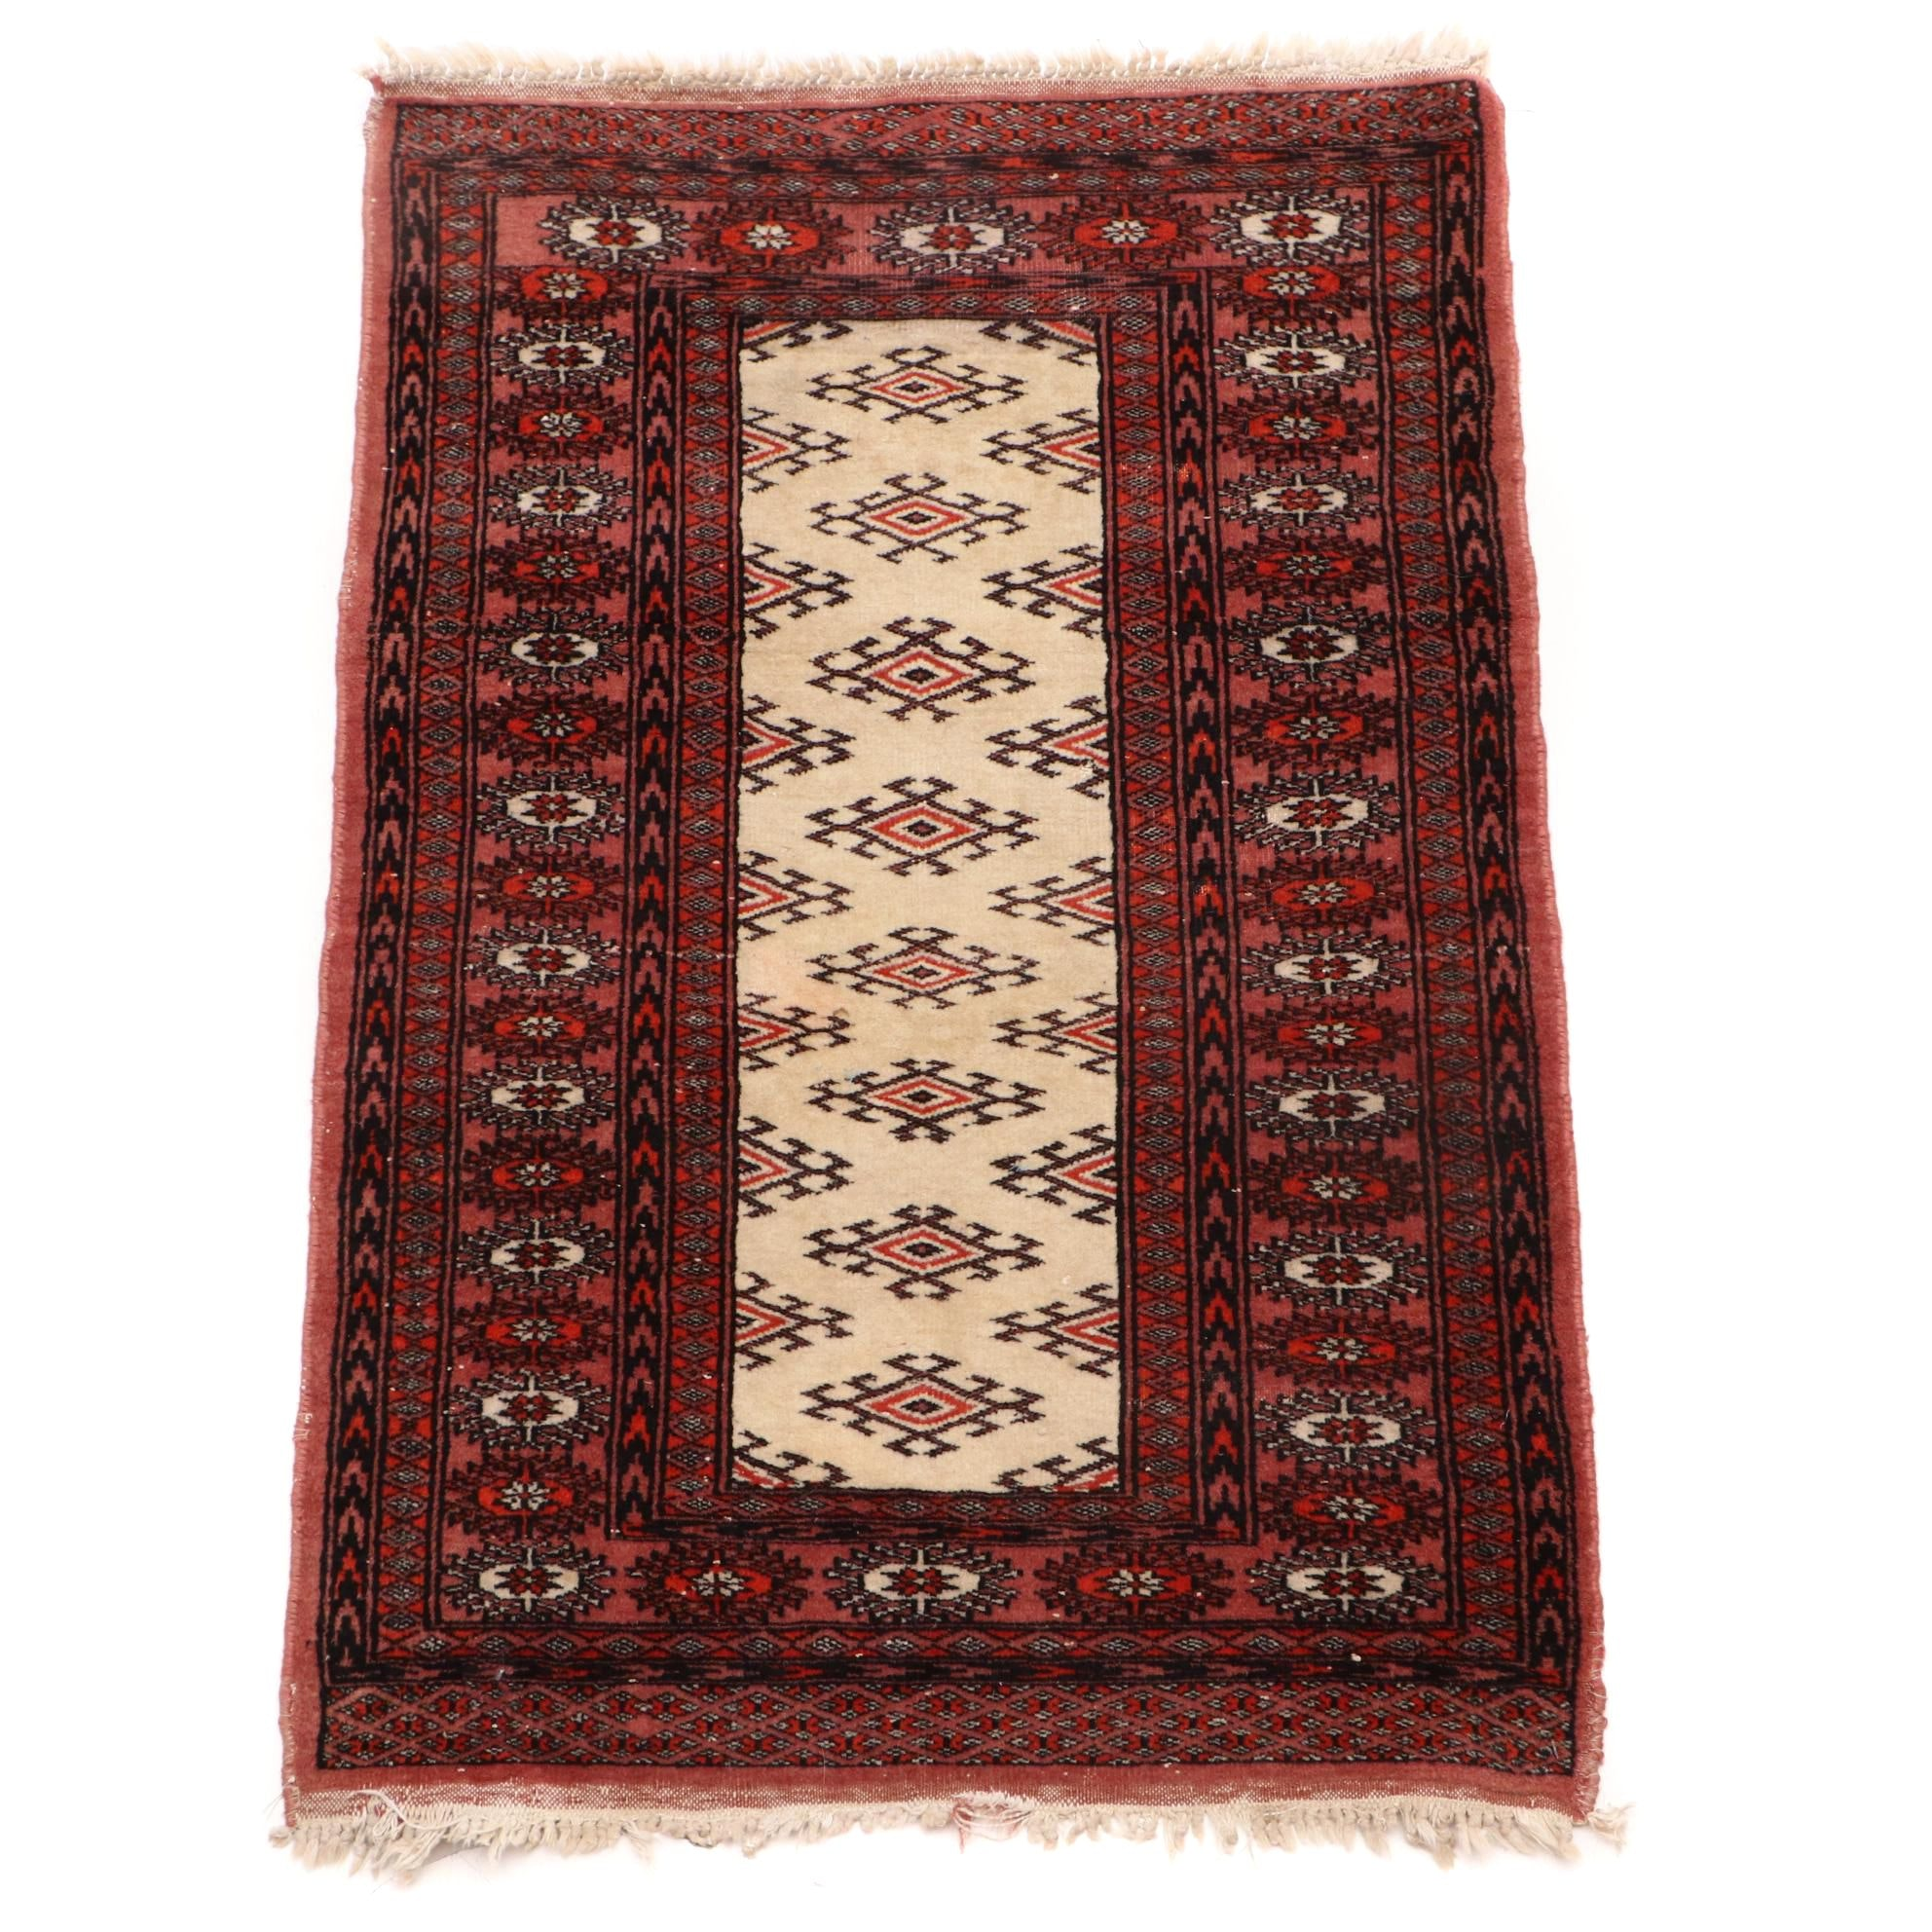 Vintage Hand-knotted Turkmen Accent Rug